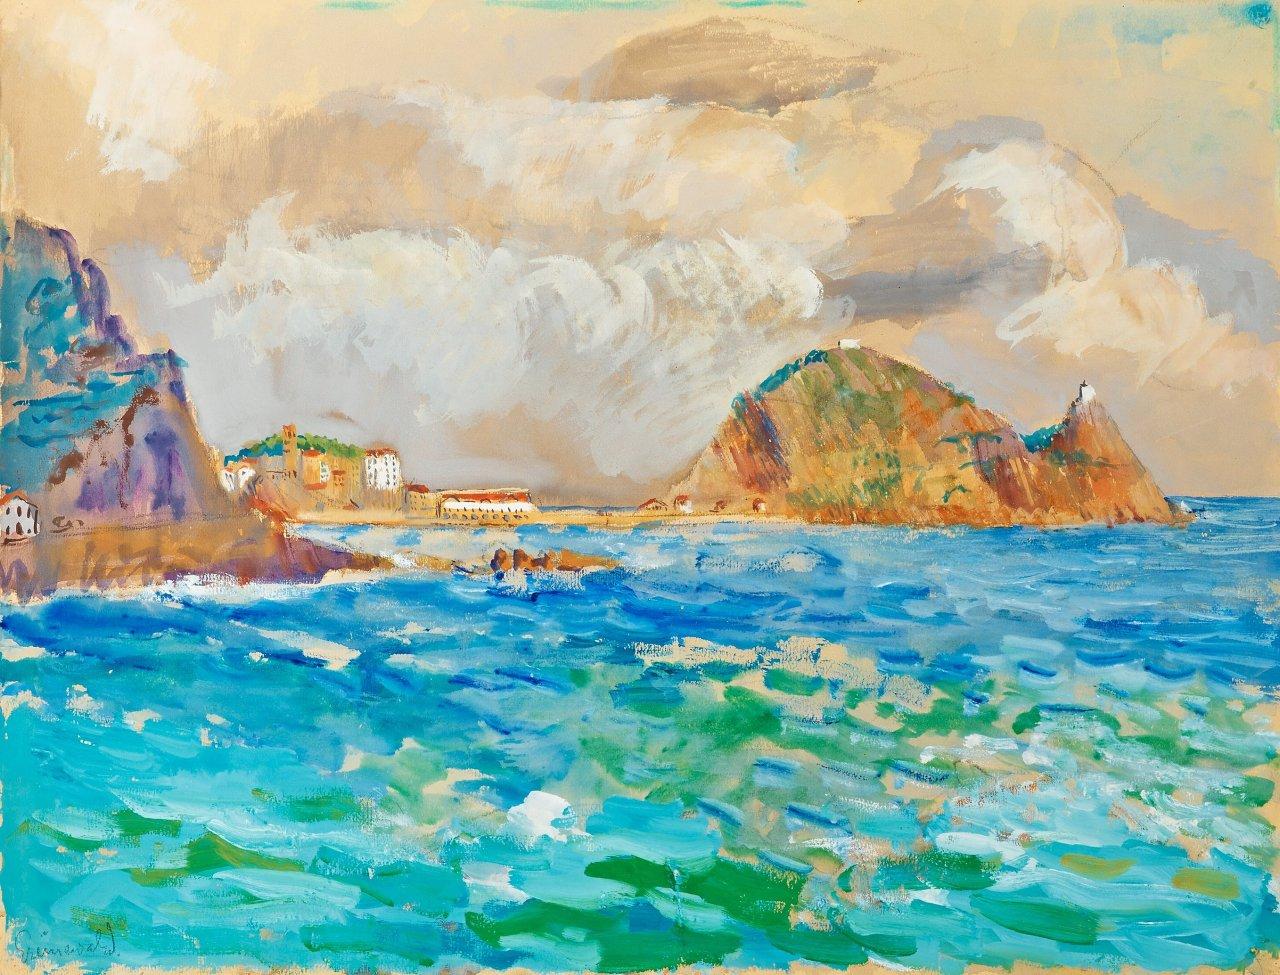 huariqueje:Approaching Storm, France.-   Isaac Grünewald Swedish 1889-1946Gouache and watercolour 49.5 x 65 cm.